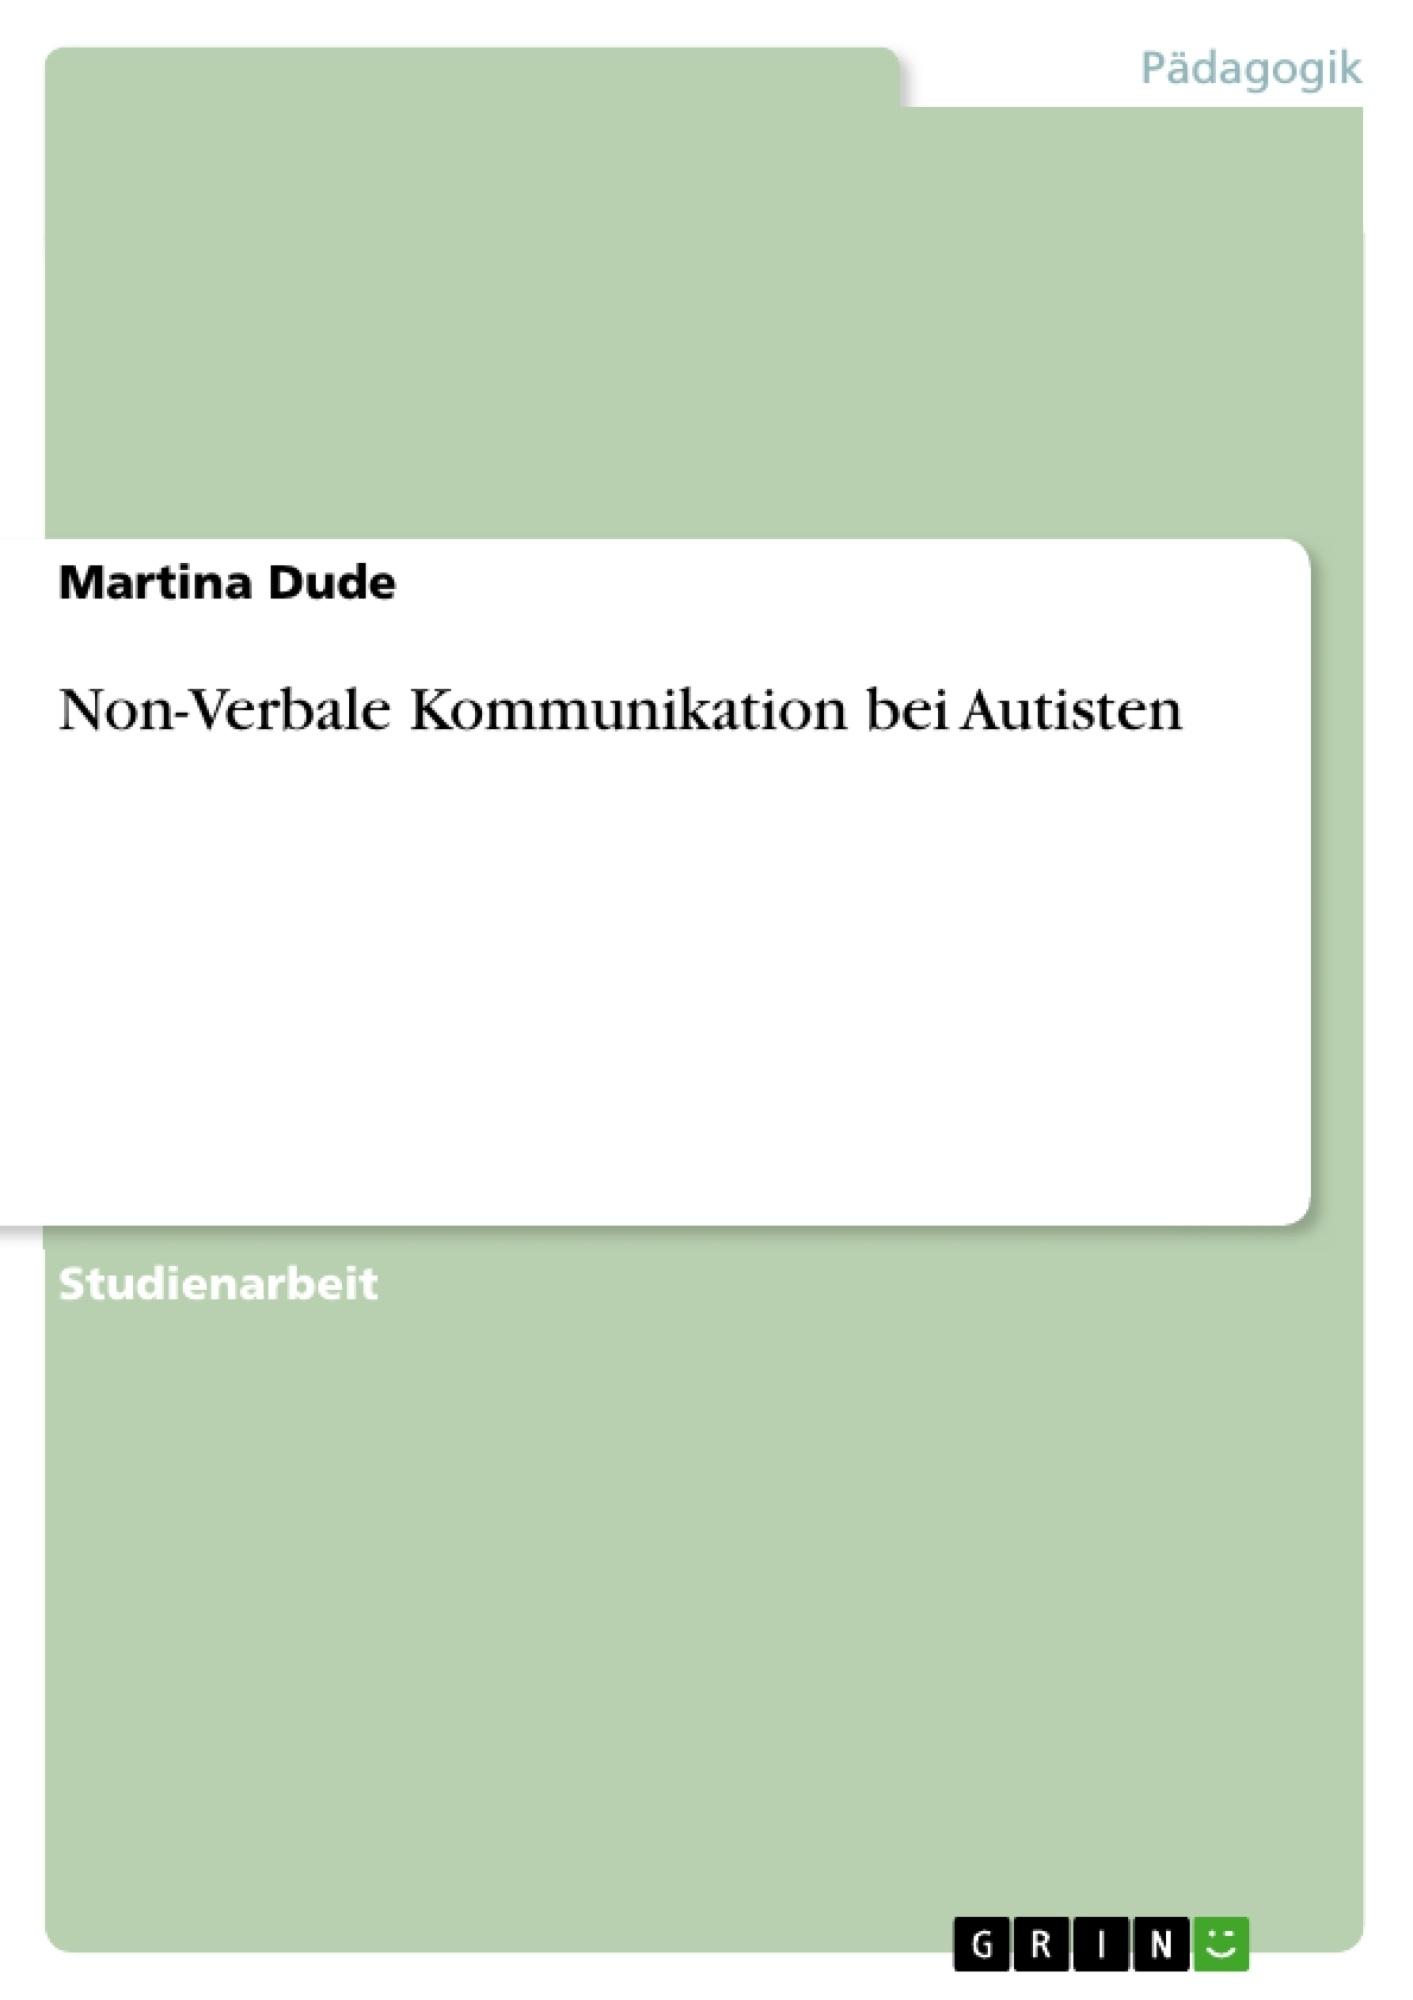 Titel: Non-Verbale Kommunikation bei Autisten